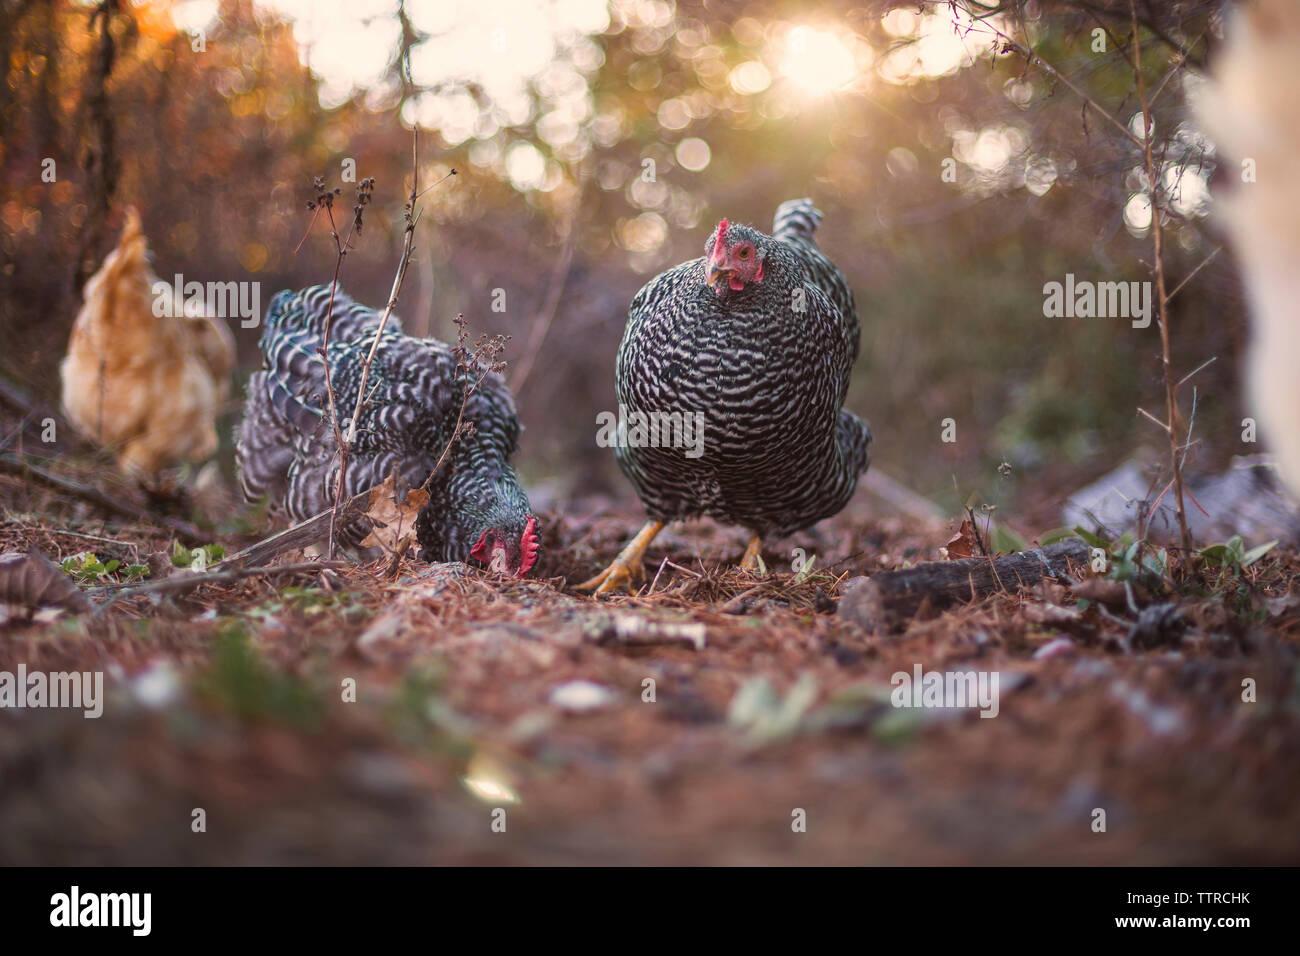 Hens on field in farm - Stock Image